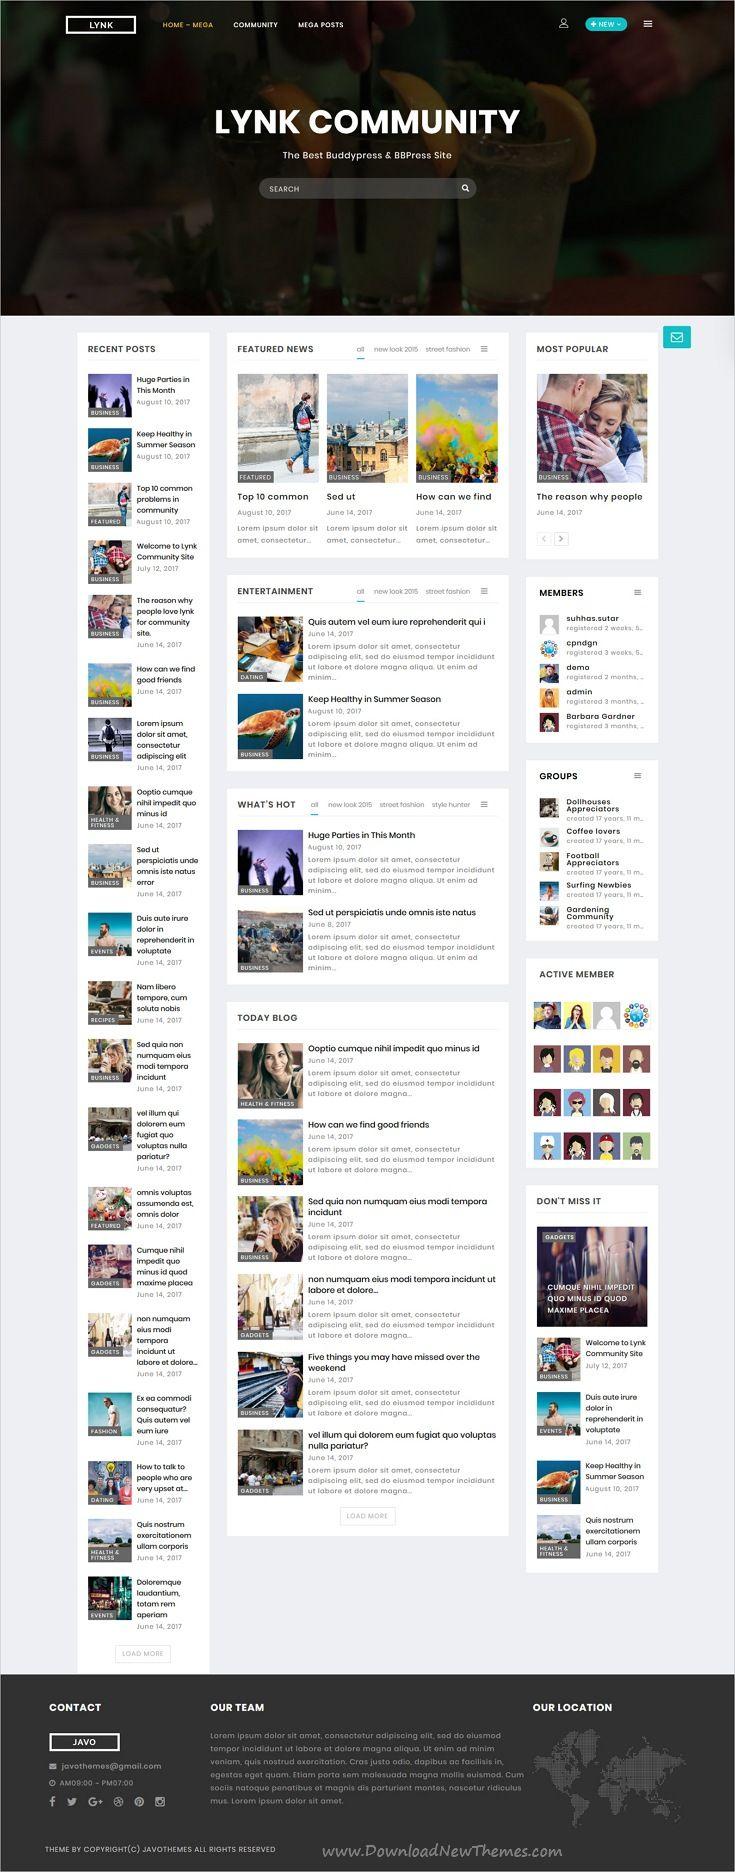 Lynk - Social Networking and Community WordPress Theme | Wordpress